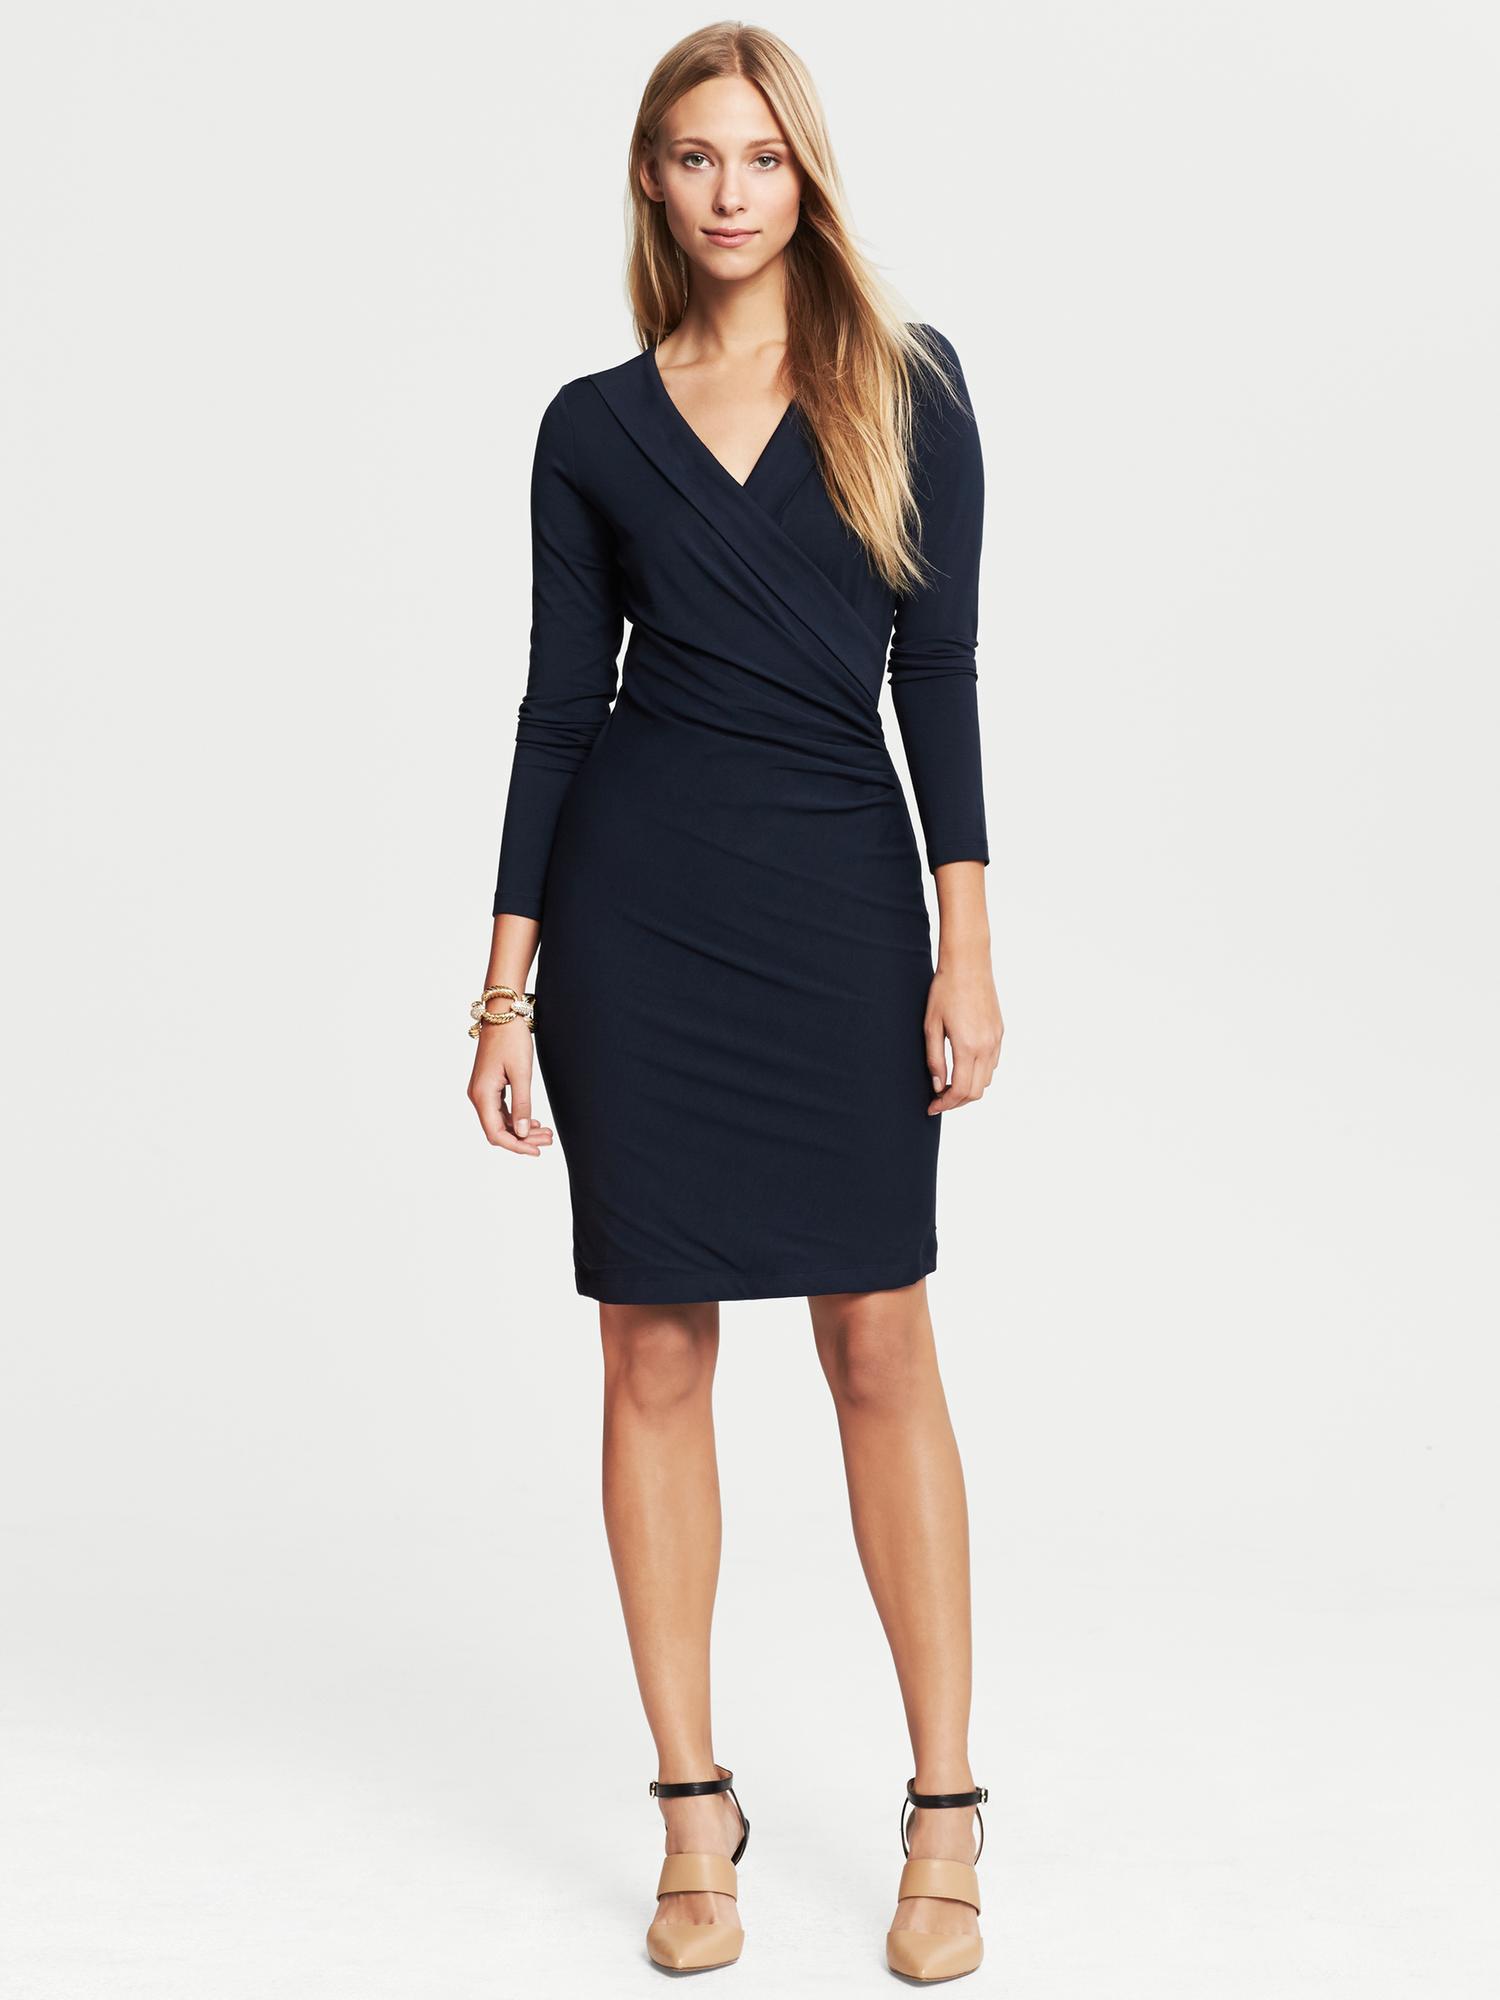 banana-republic-blue-faux-wrap-dress-true-navy-product-1-16361450-1-174063713-normal.jpeg